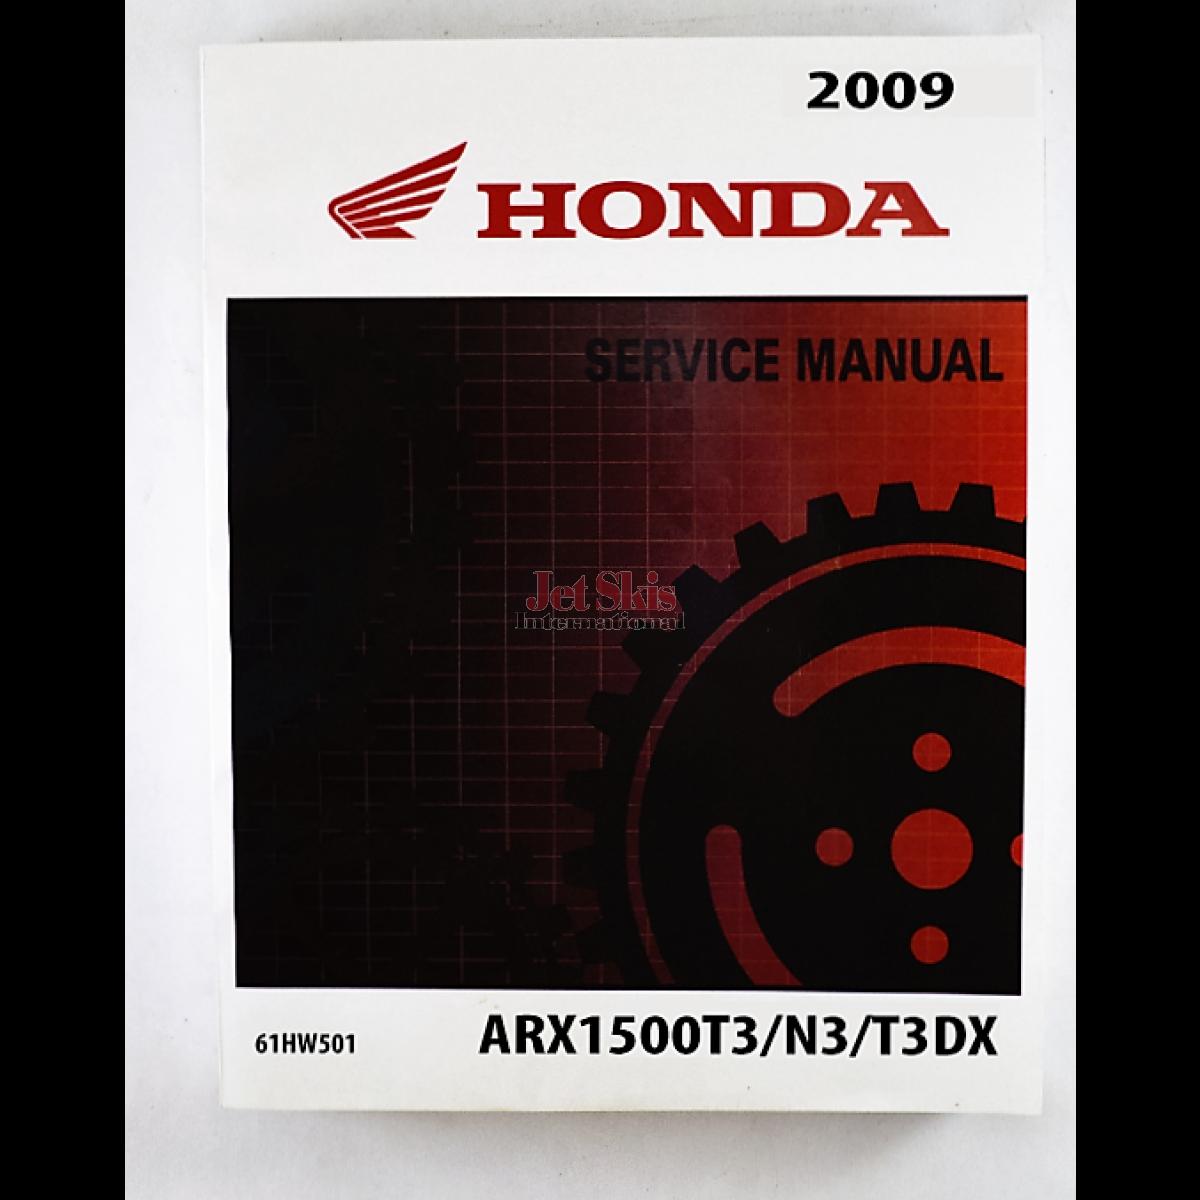 honda aquatrax f15 f15x service and shop manual 61hw501 jet skis rh jetskisint com Riced Out Honda Honda Type R